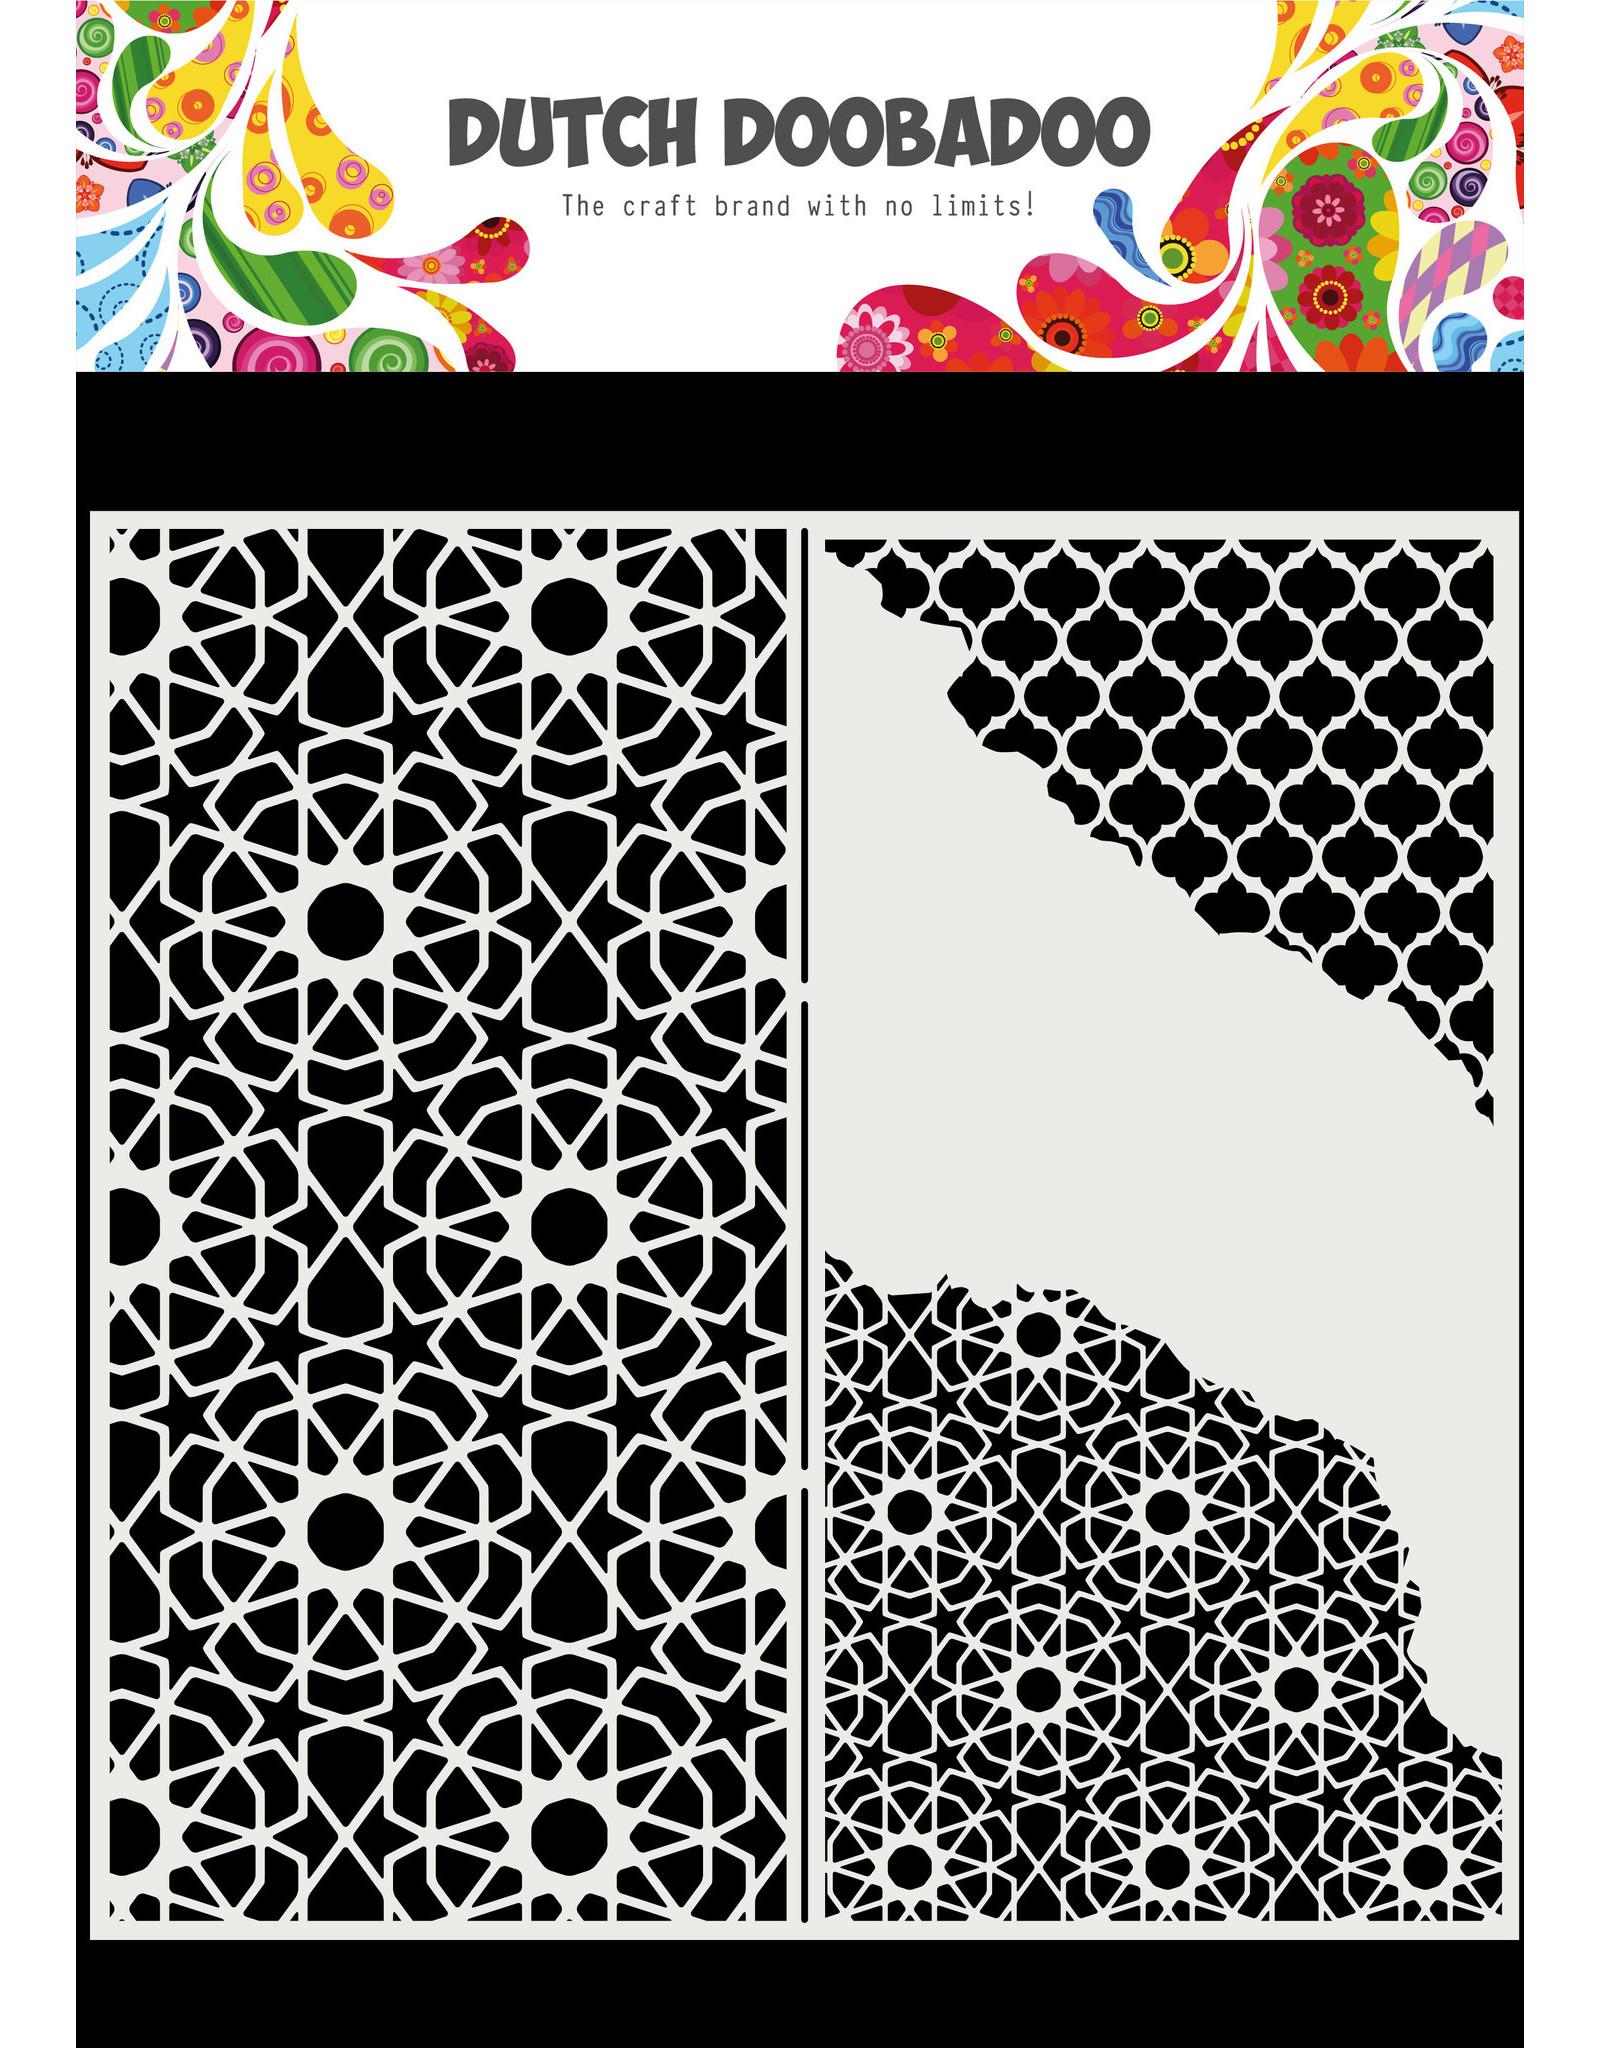 Dutch Doobadoo DDBD Mask Art Slimline Cracked Patterns